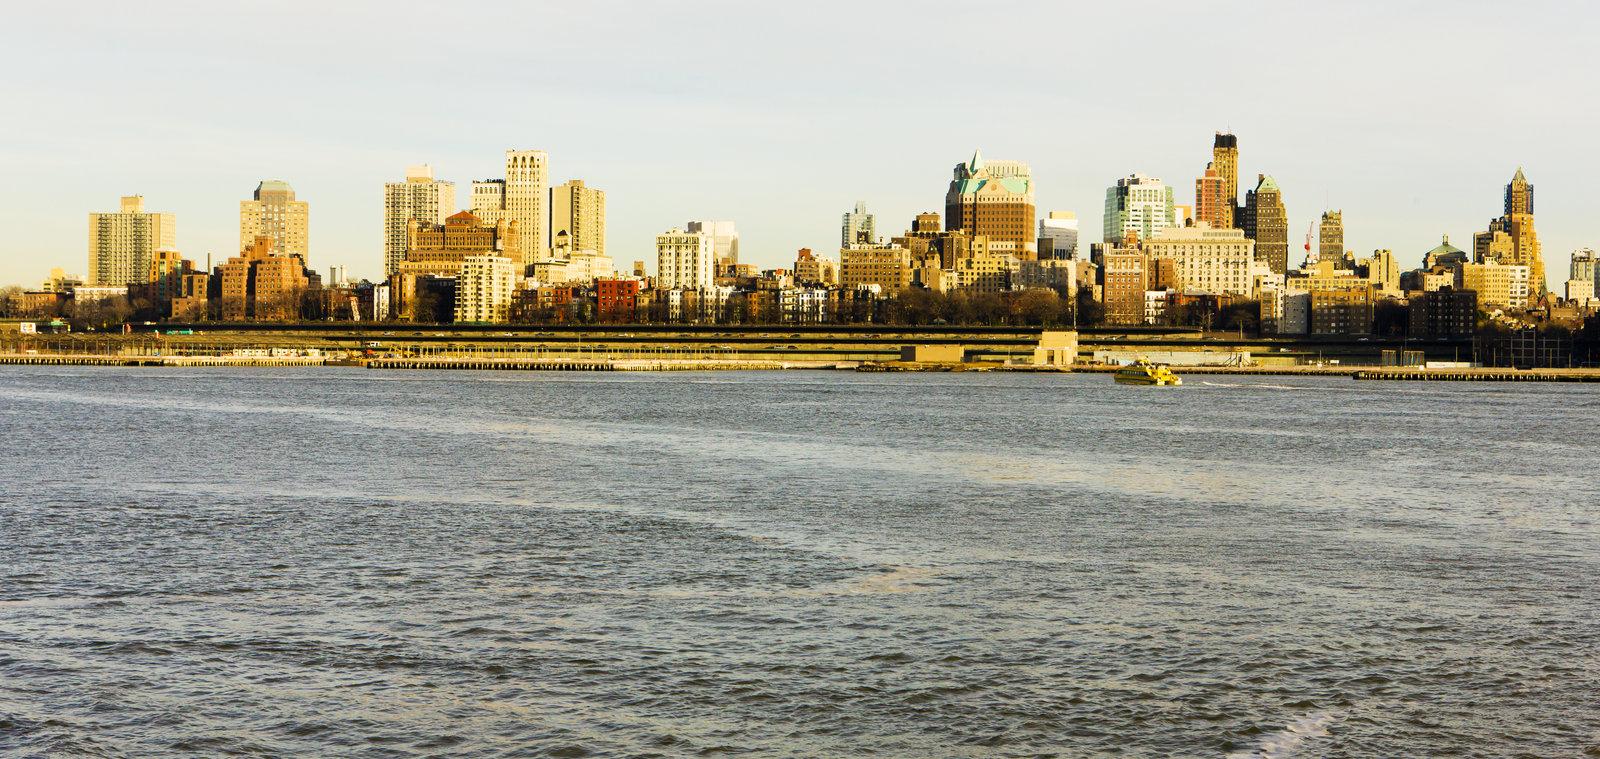 Bushwick Brooklyn, NY Private Investiagtor